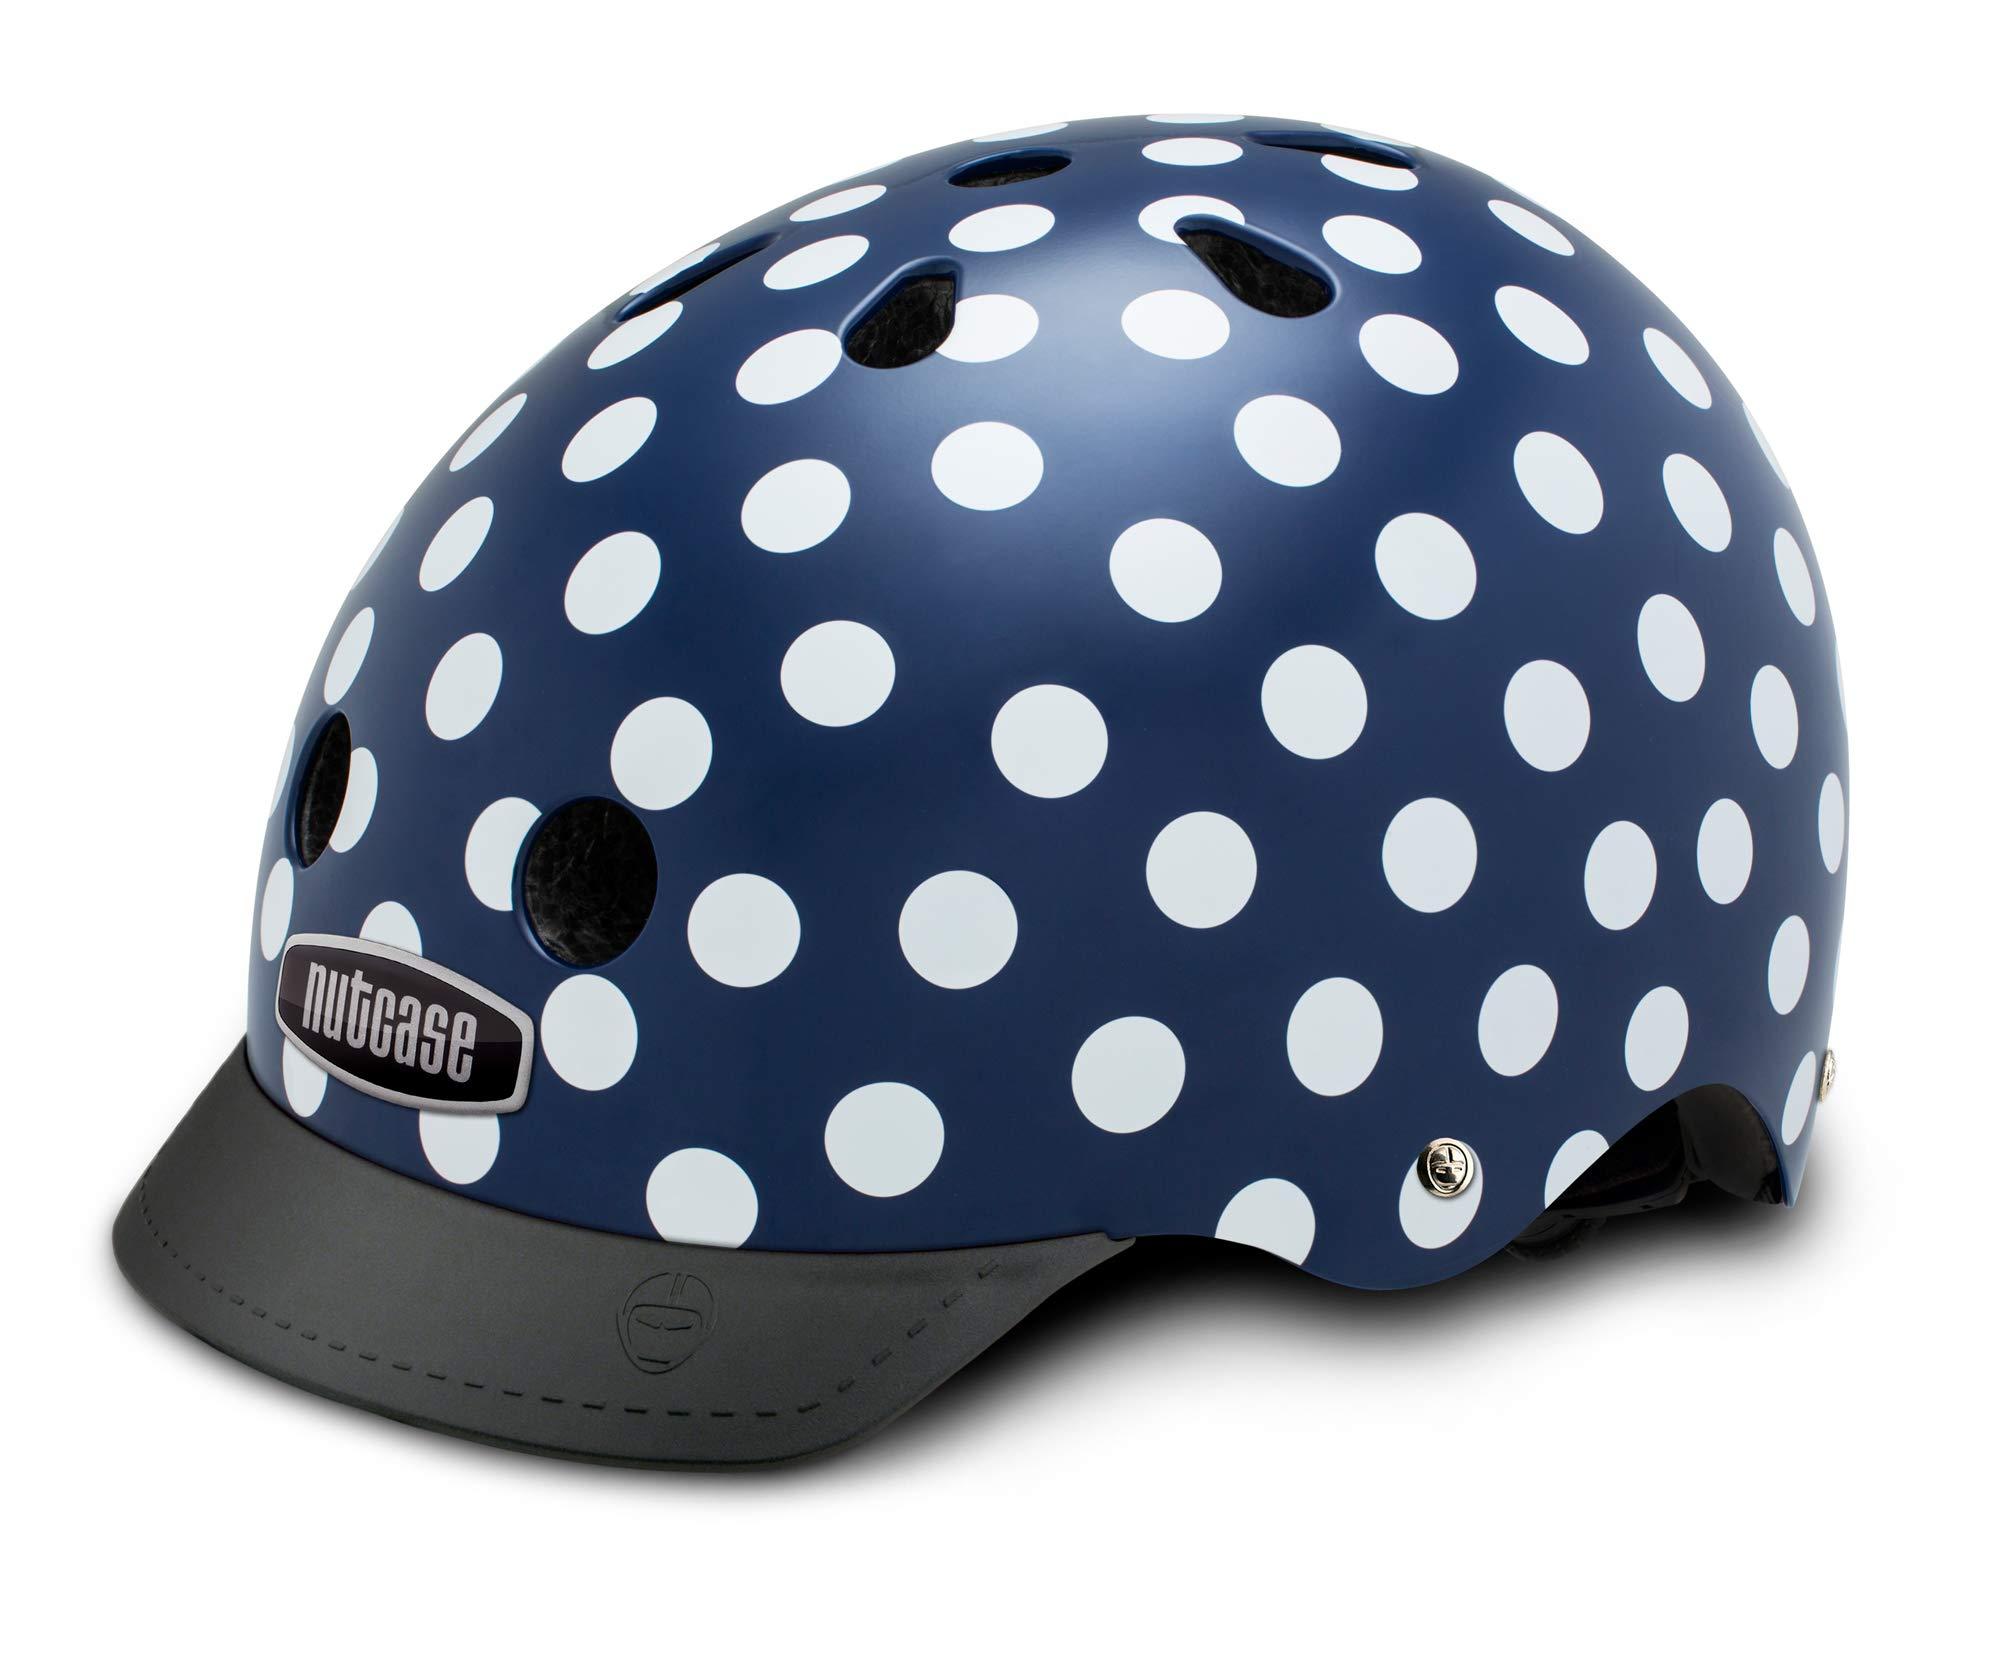 Nutcase - Patterned Street Bike Helmet for Adults, Navy Dots, Large by Nutcase